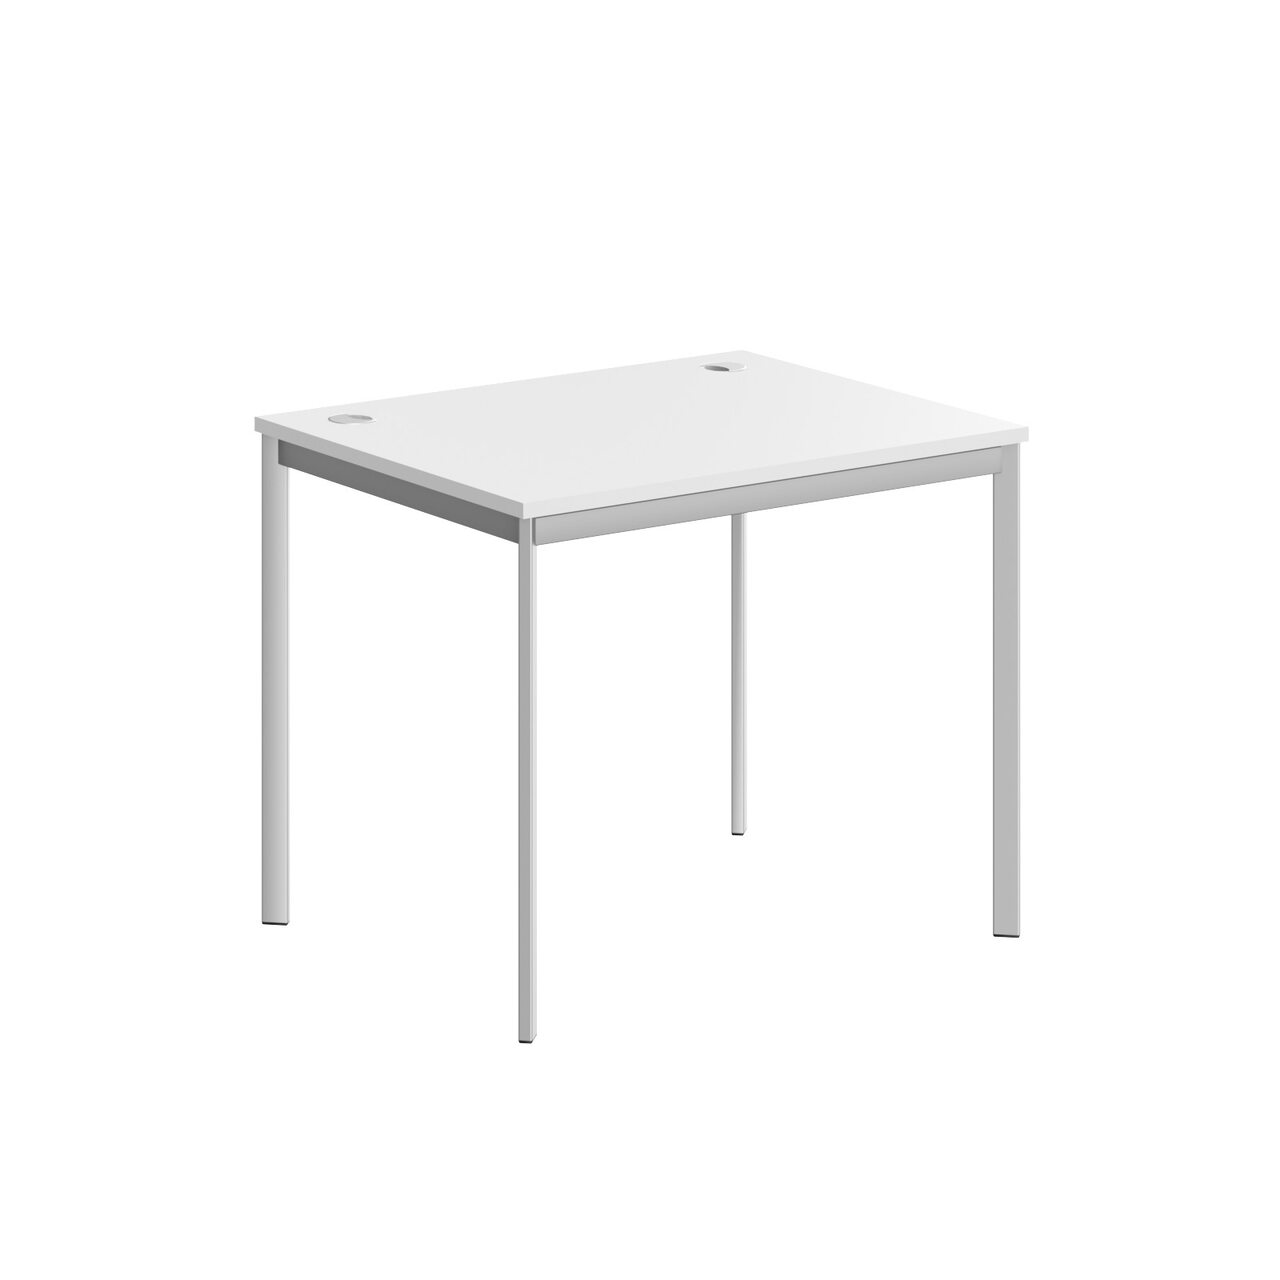 Стол прямой  IMAGO-S 90x72x76 - фото 2